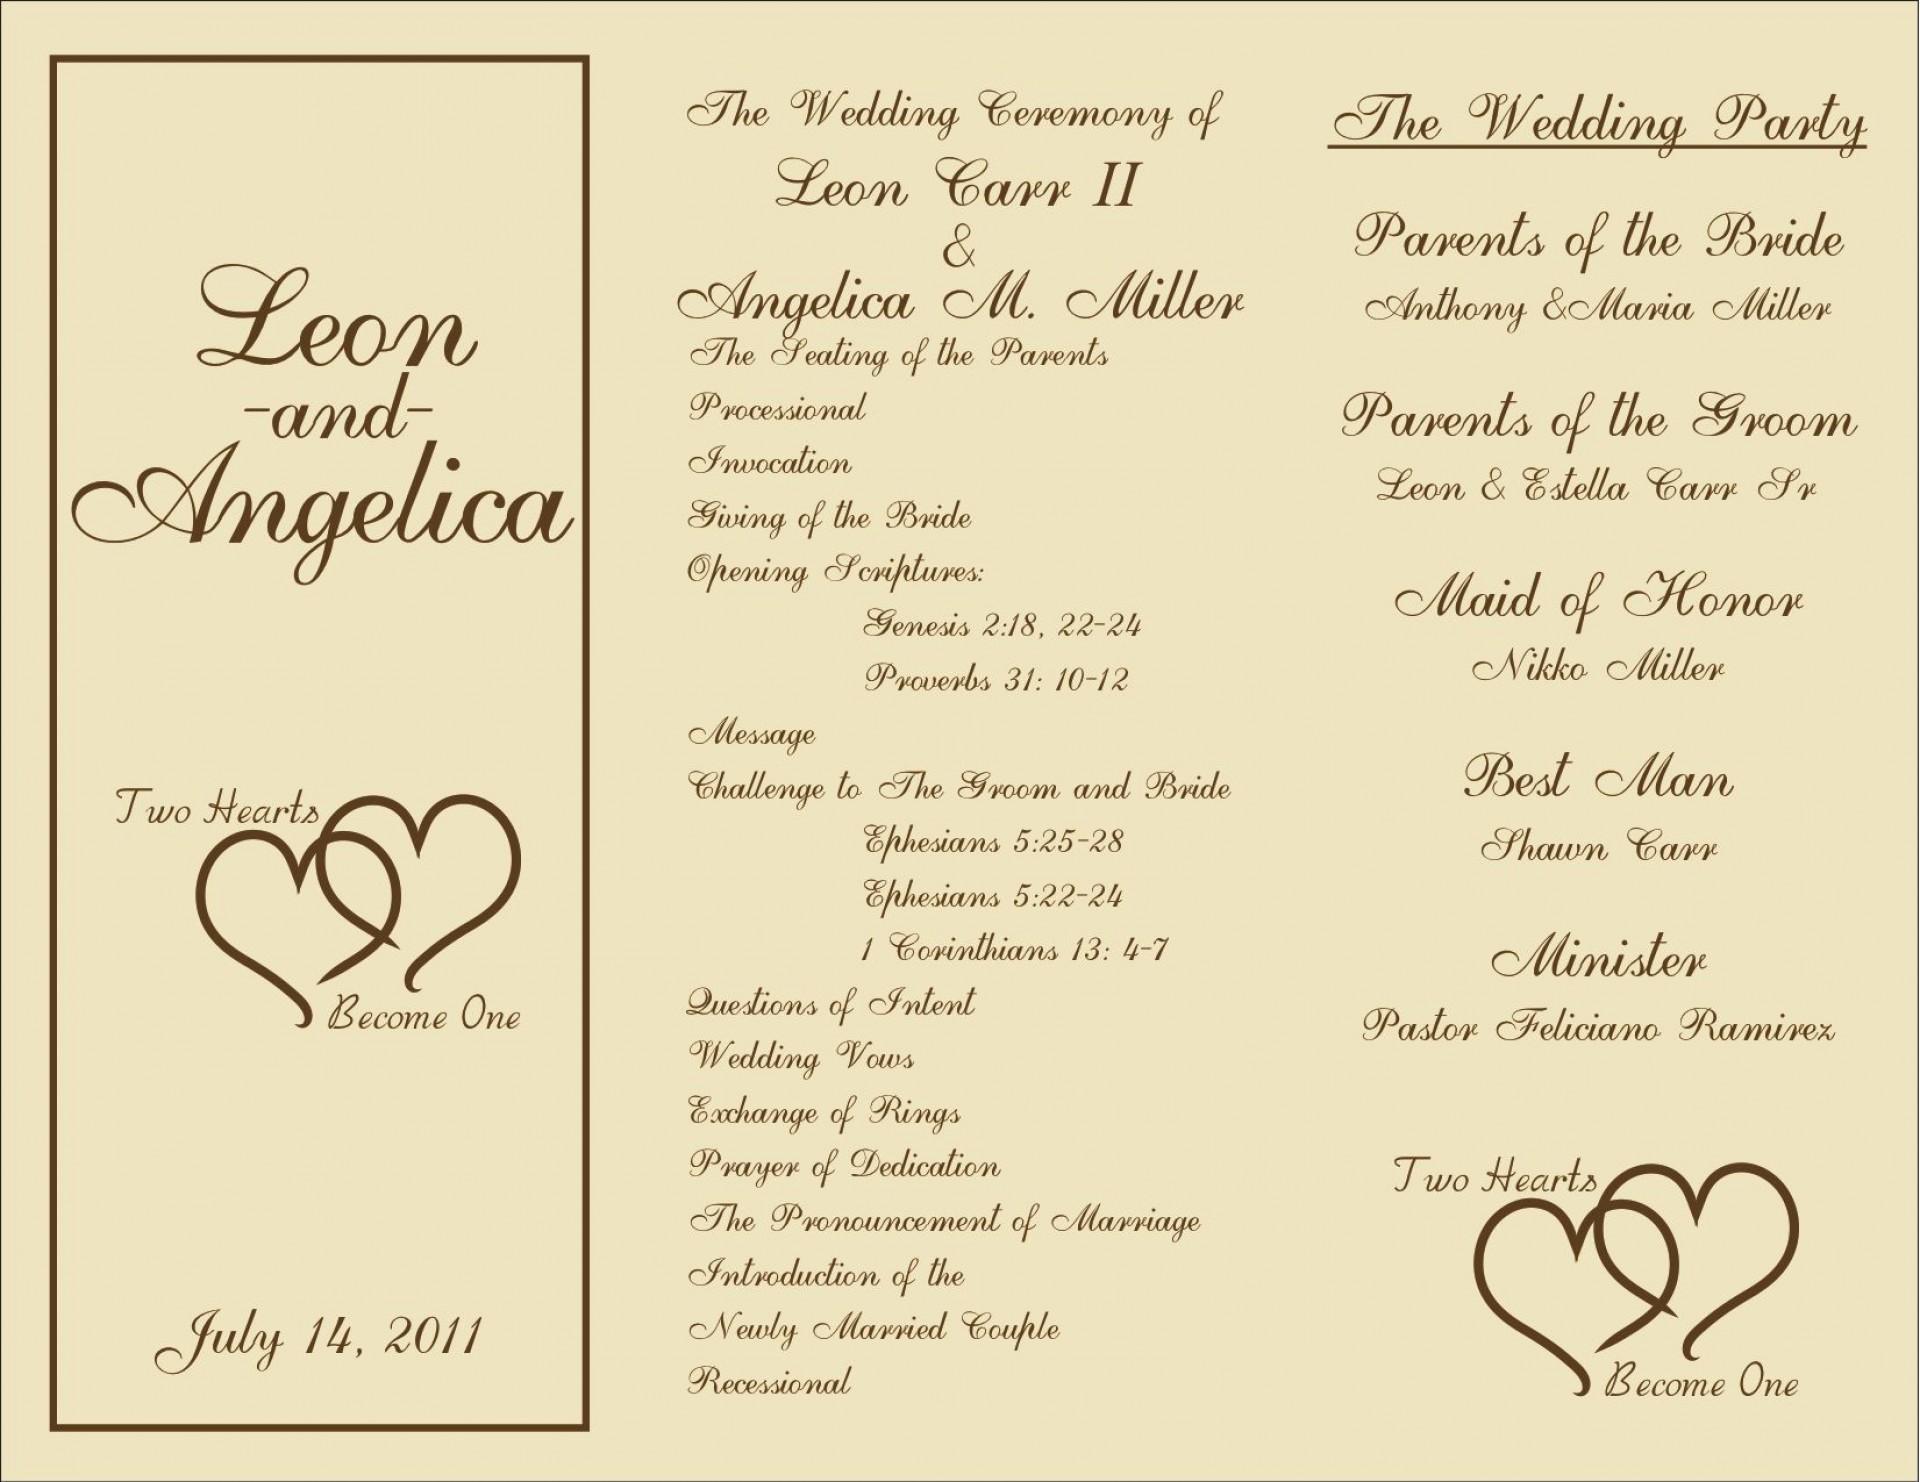 006 Dreaded Free Word Template For Wedding Program Image  Programs1920